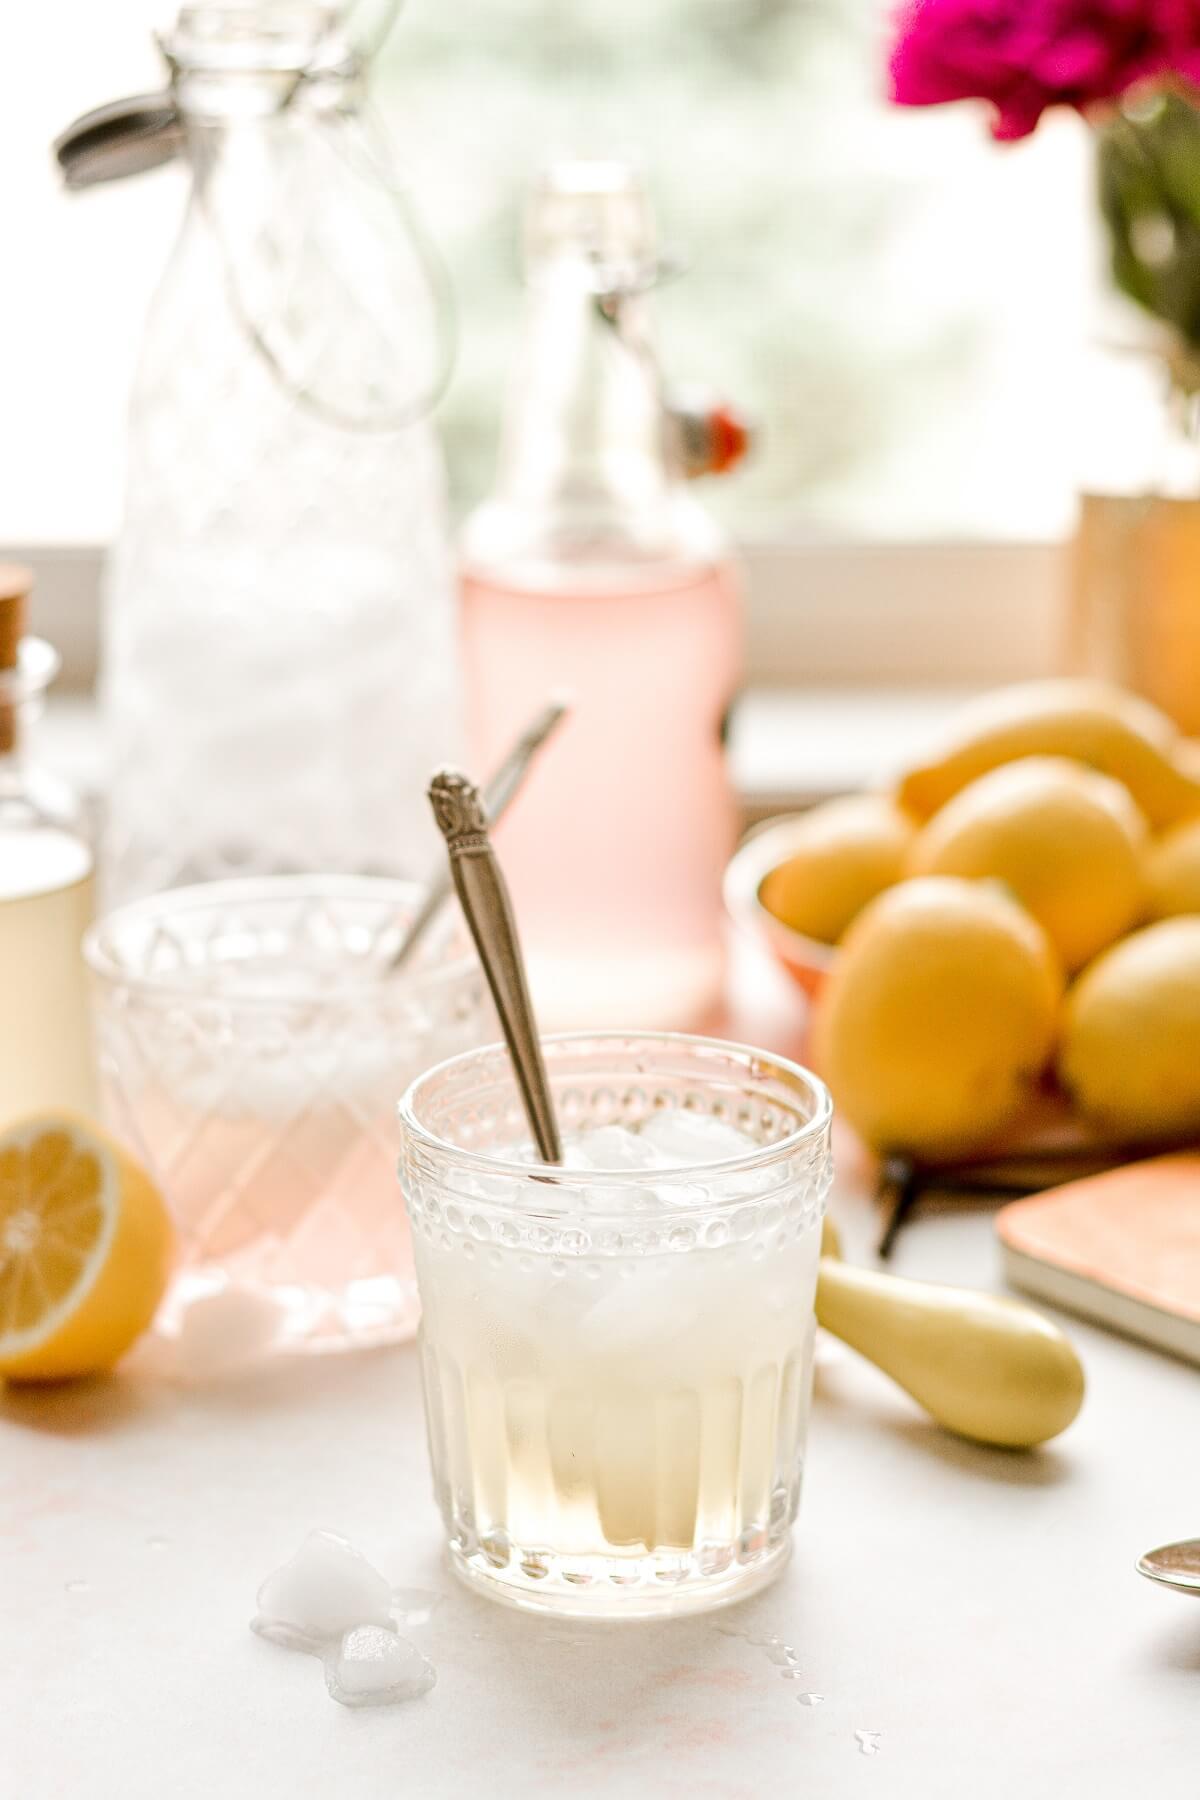 Homemade lemonade, with rhubarb and ginger syrup.